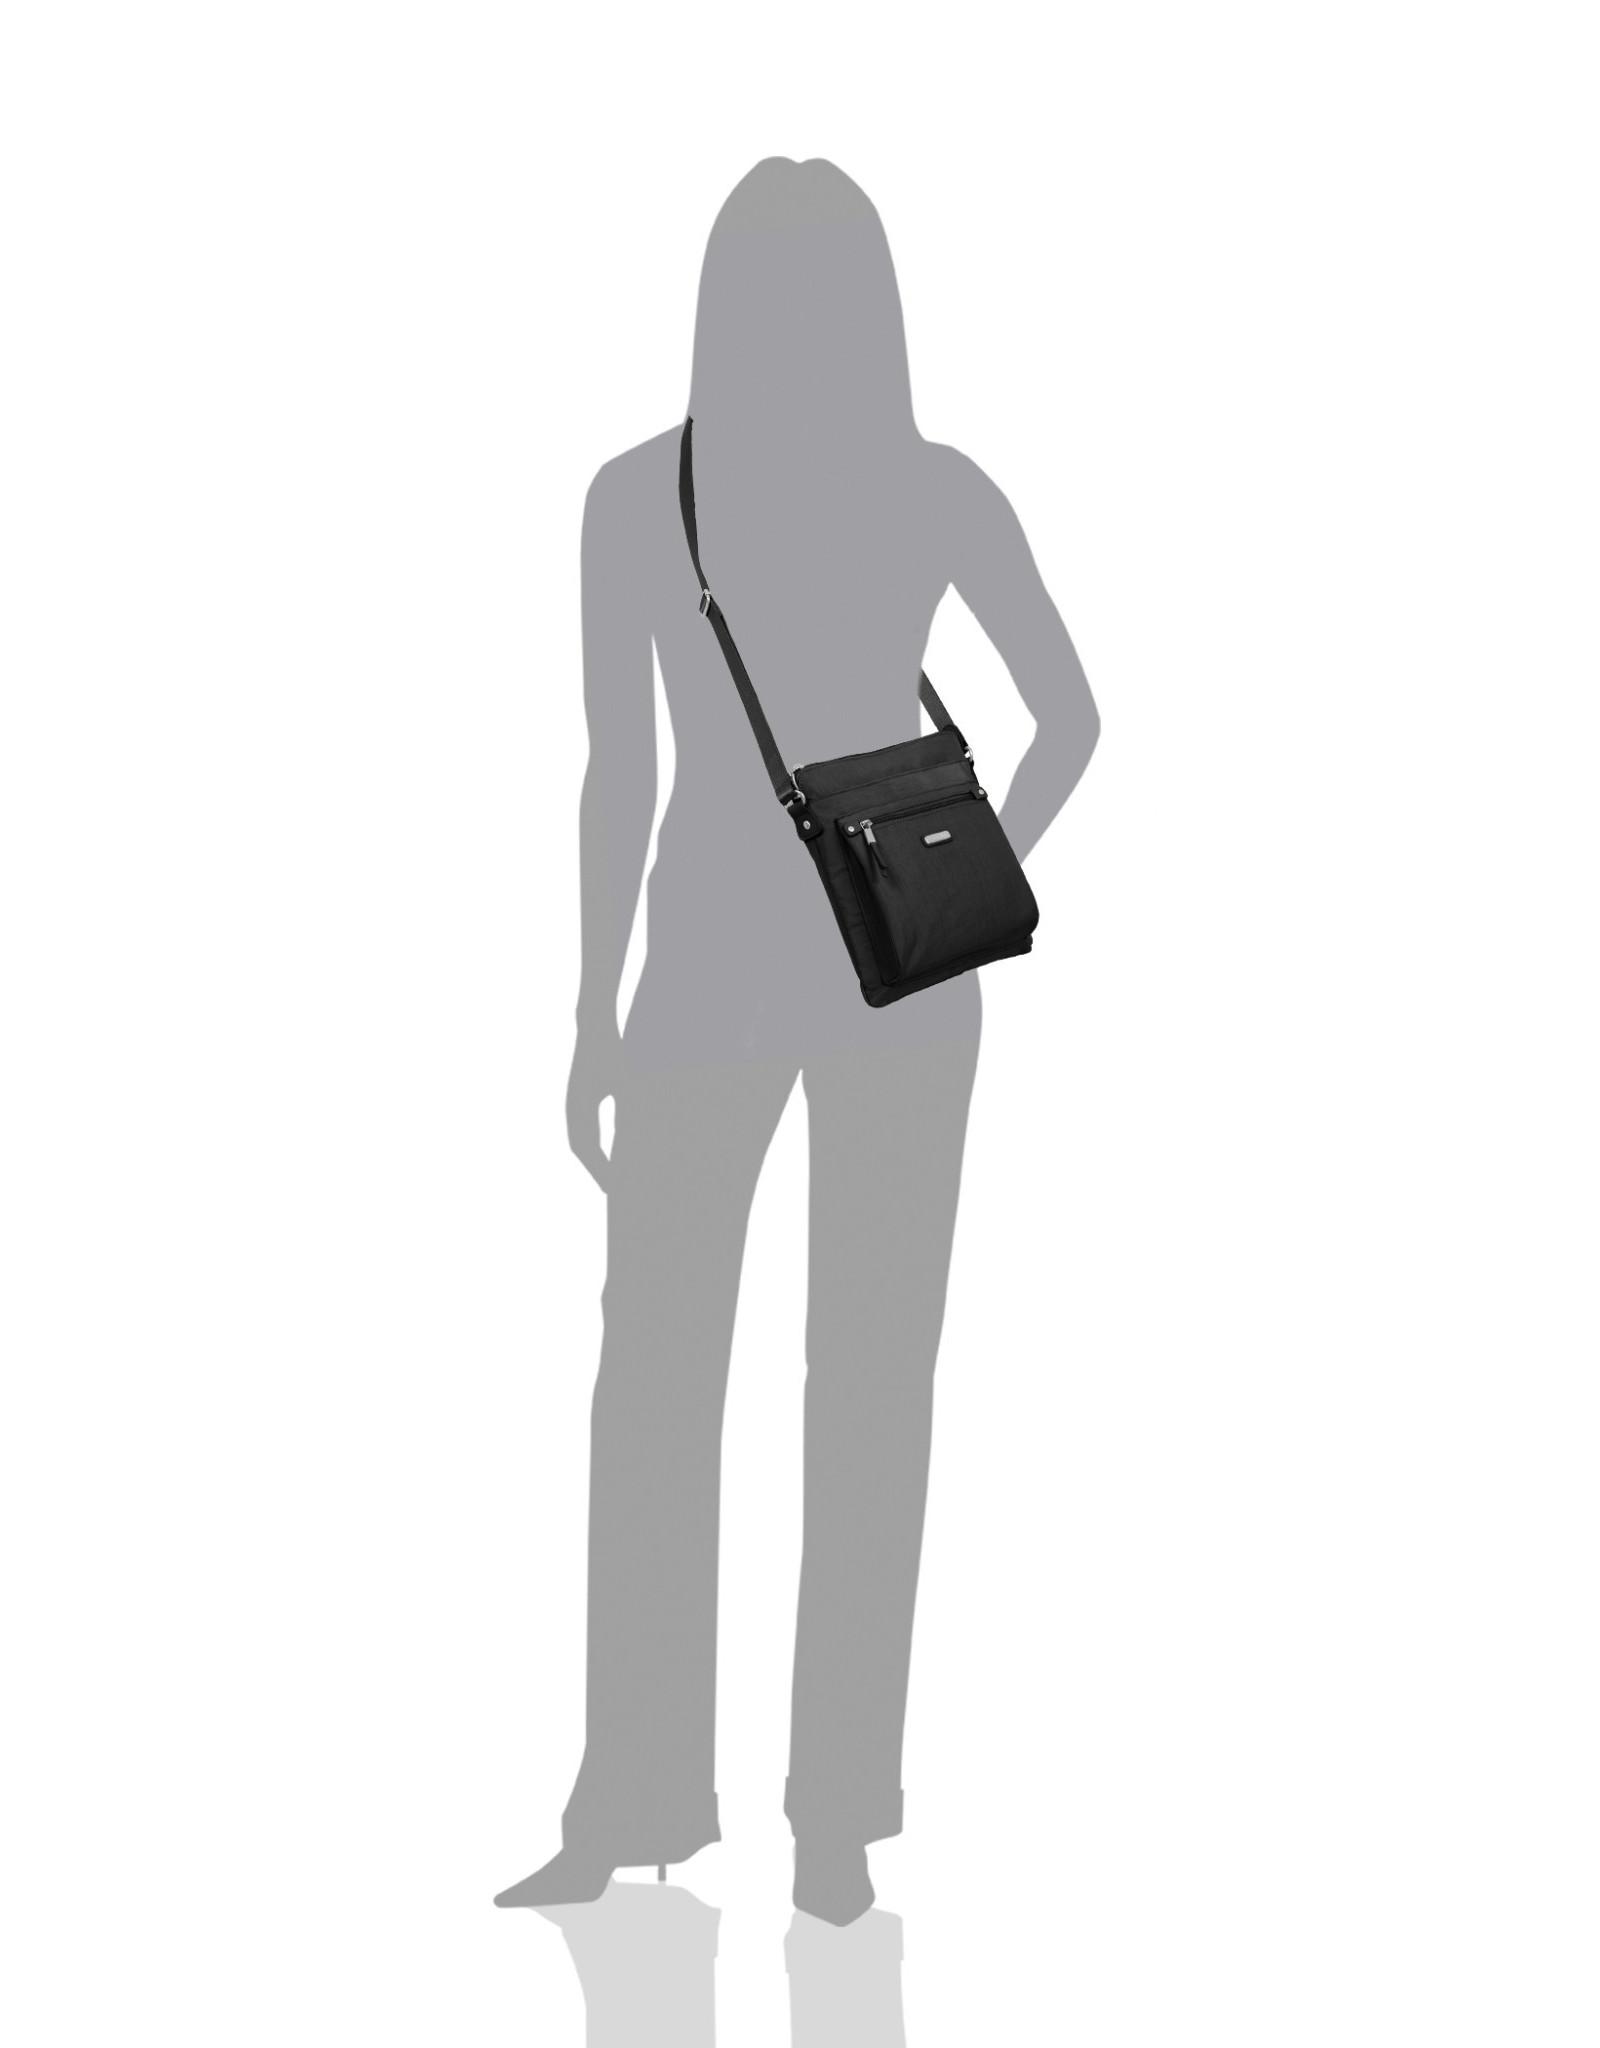 Baggallini Go Bagg with RFID Wristlet - Black